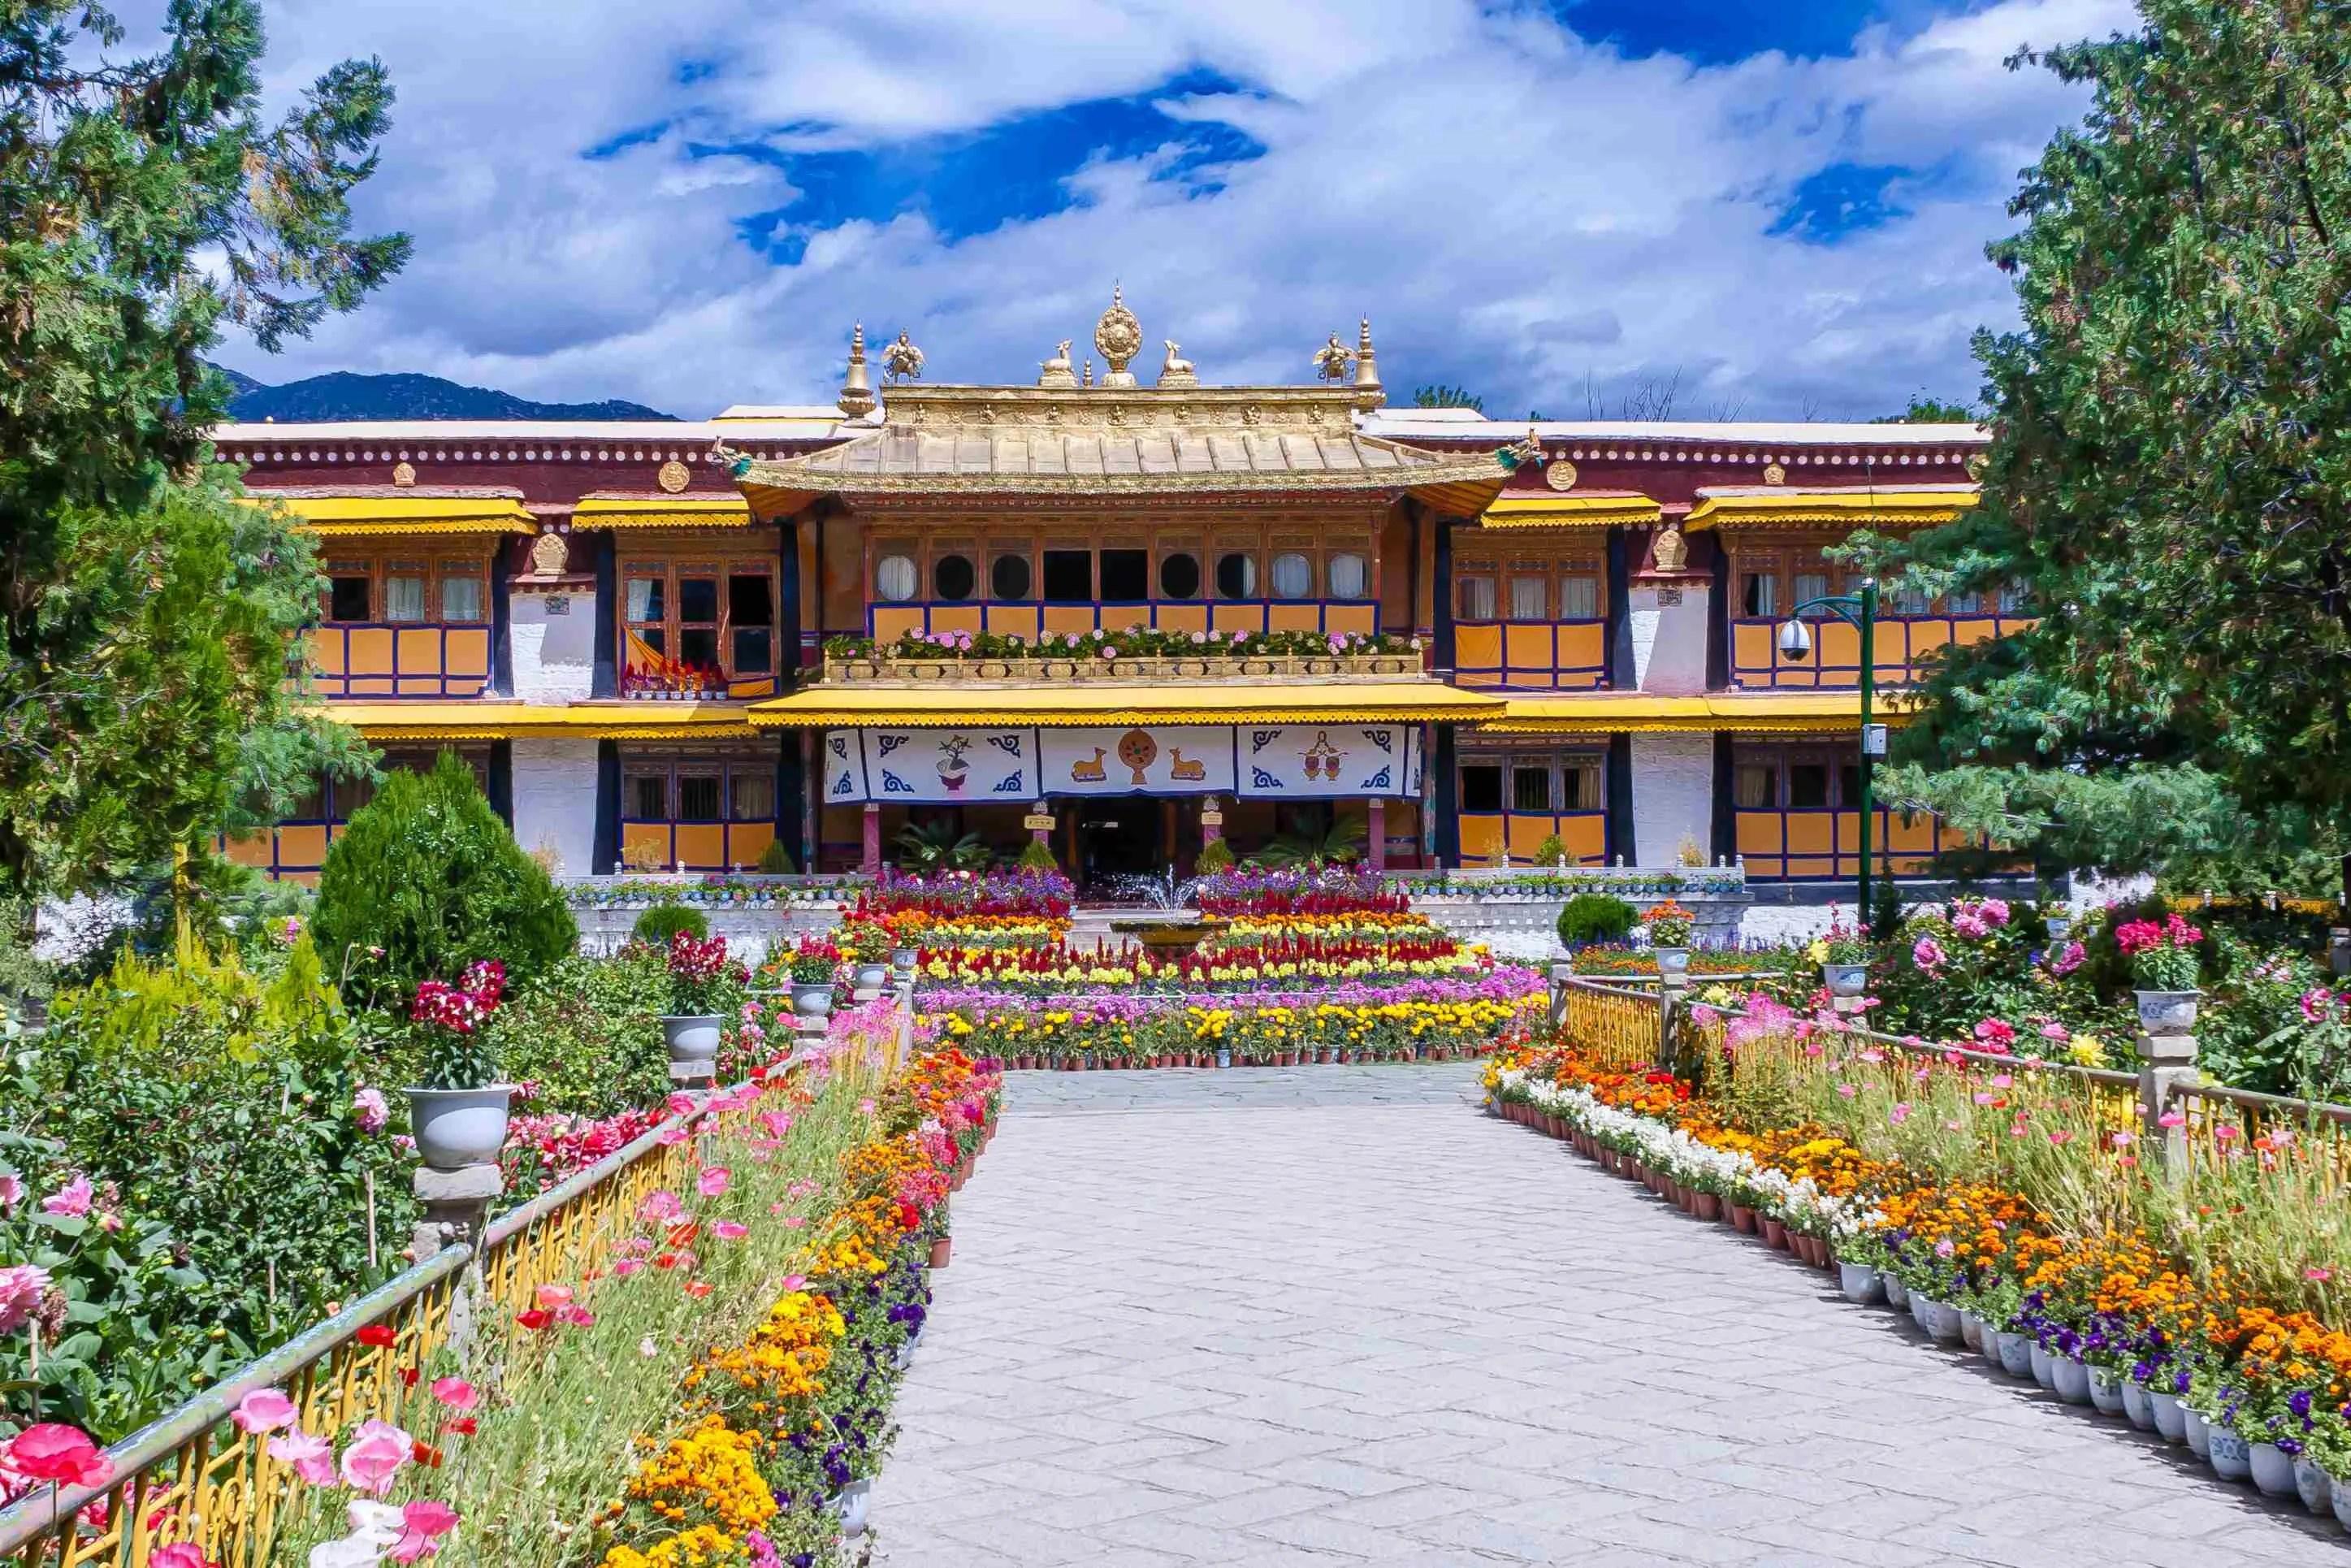 Norbulingka The Summer Residence of Dalai Lama in Lhasa